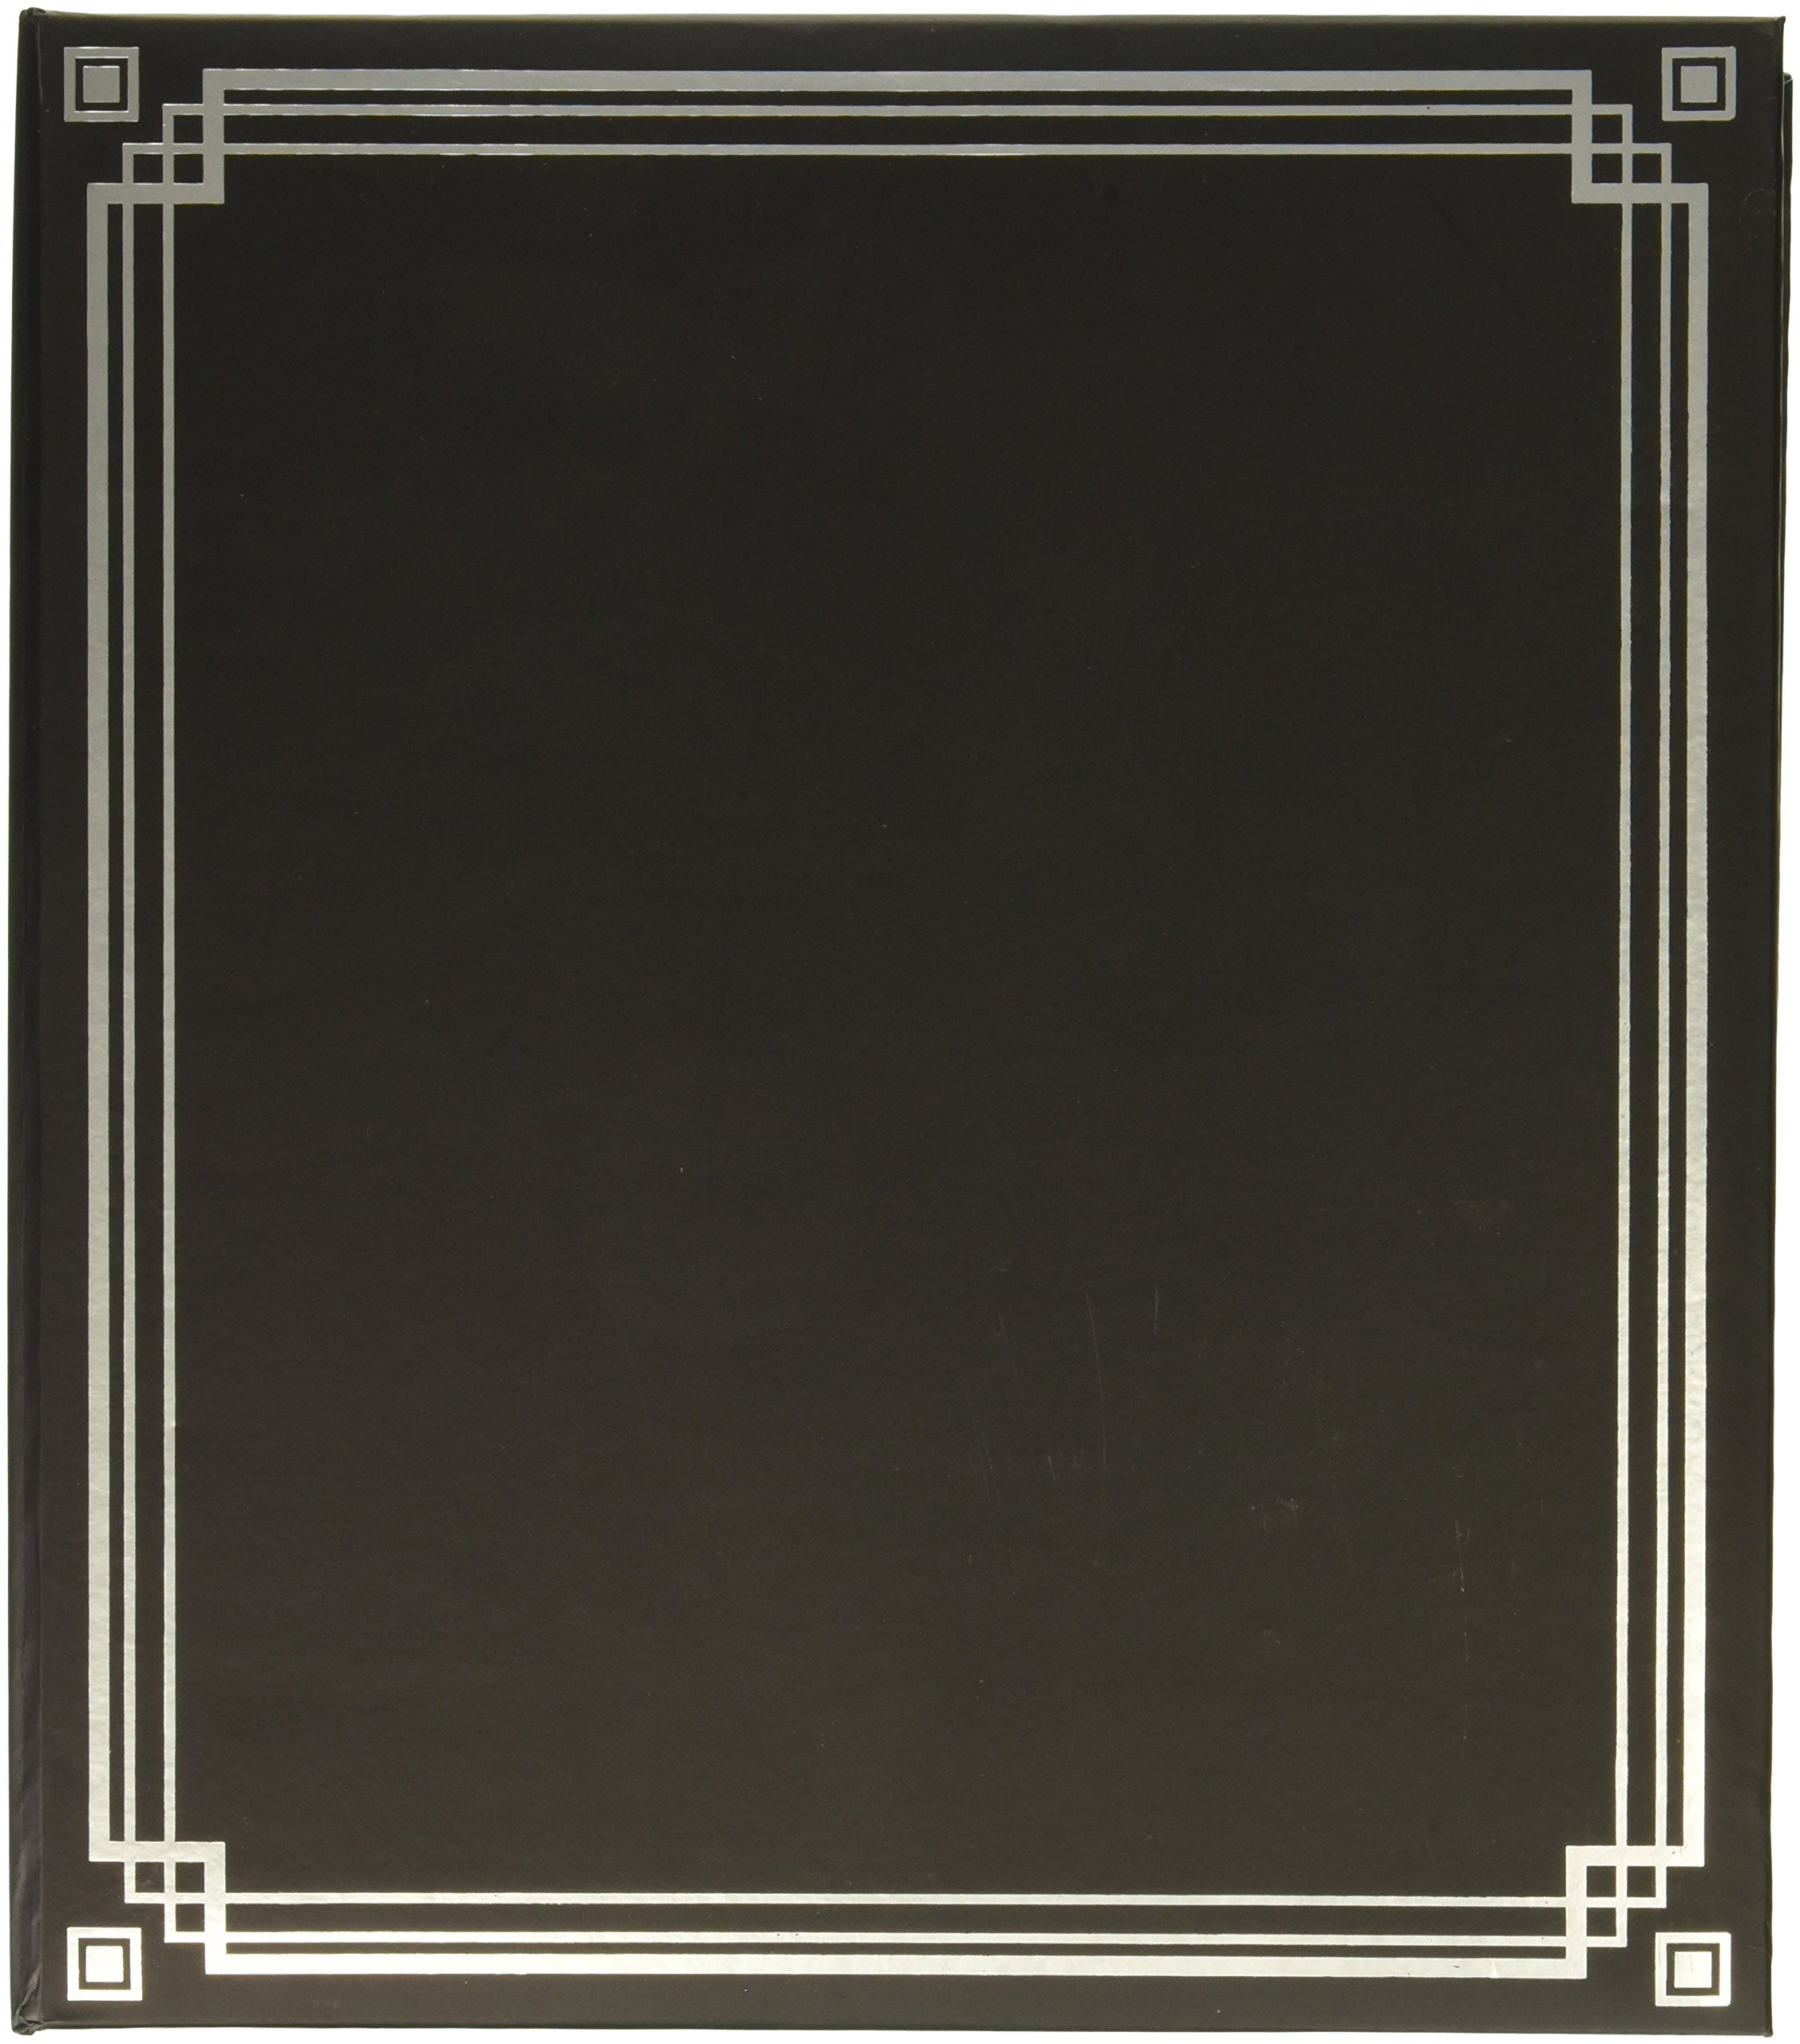 K&Company 30-705852 9.75'' x 11.25'' Magnetic Binder Photo Album